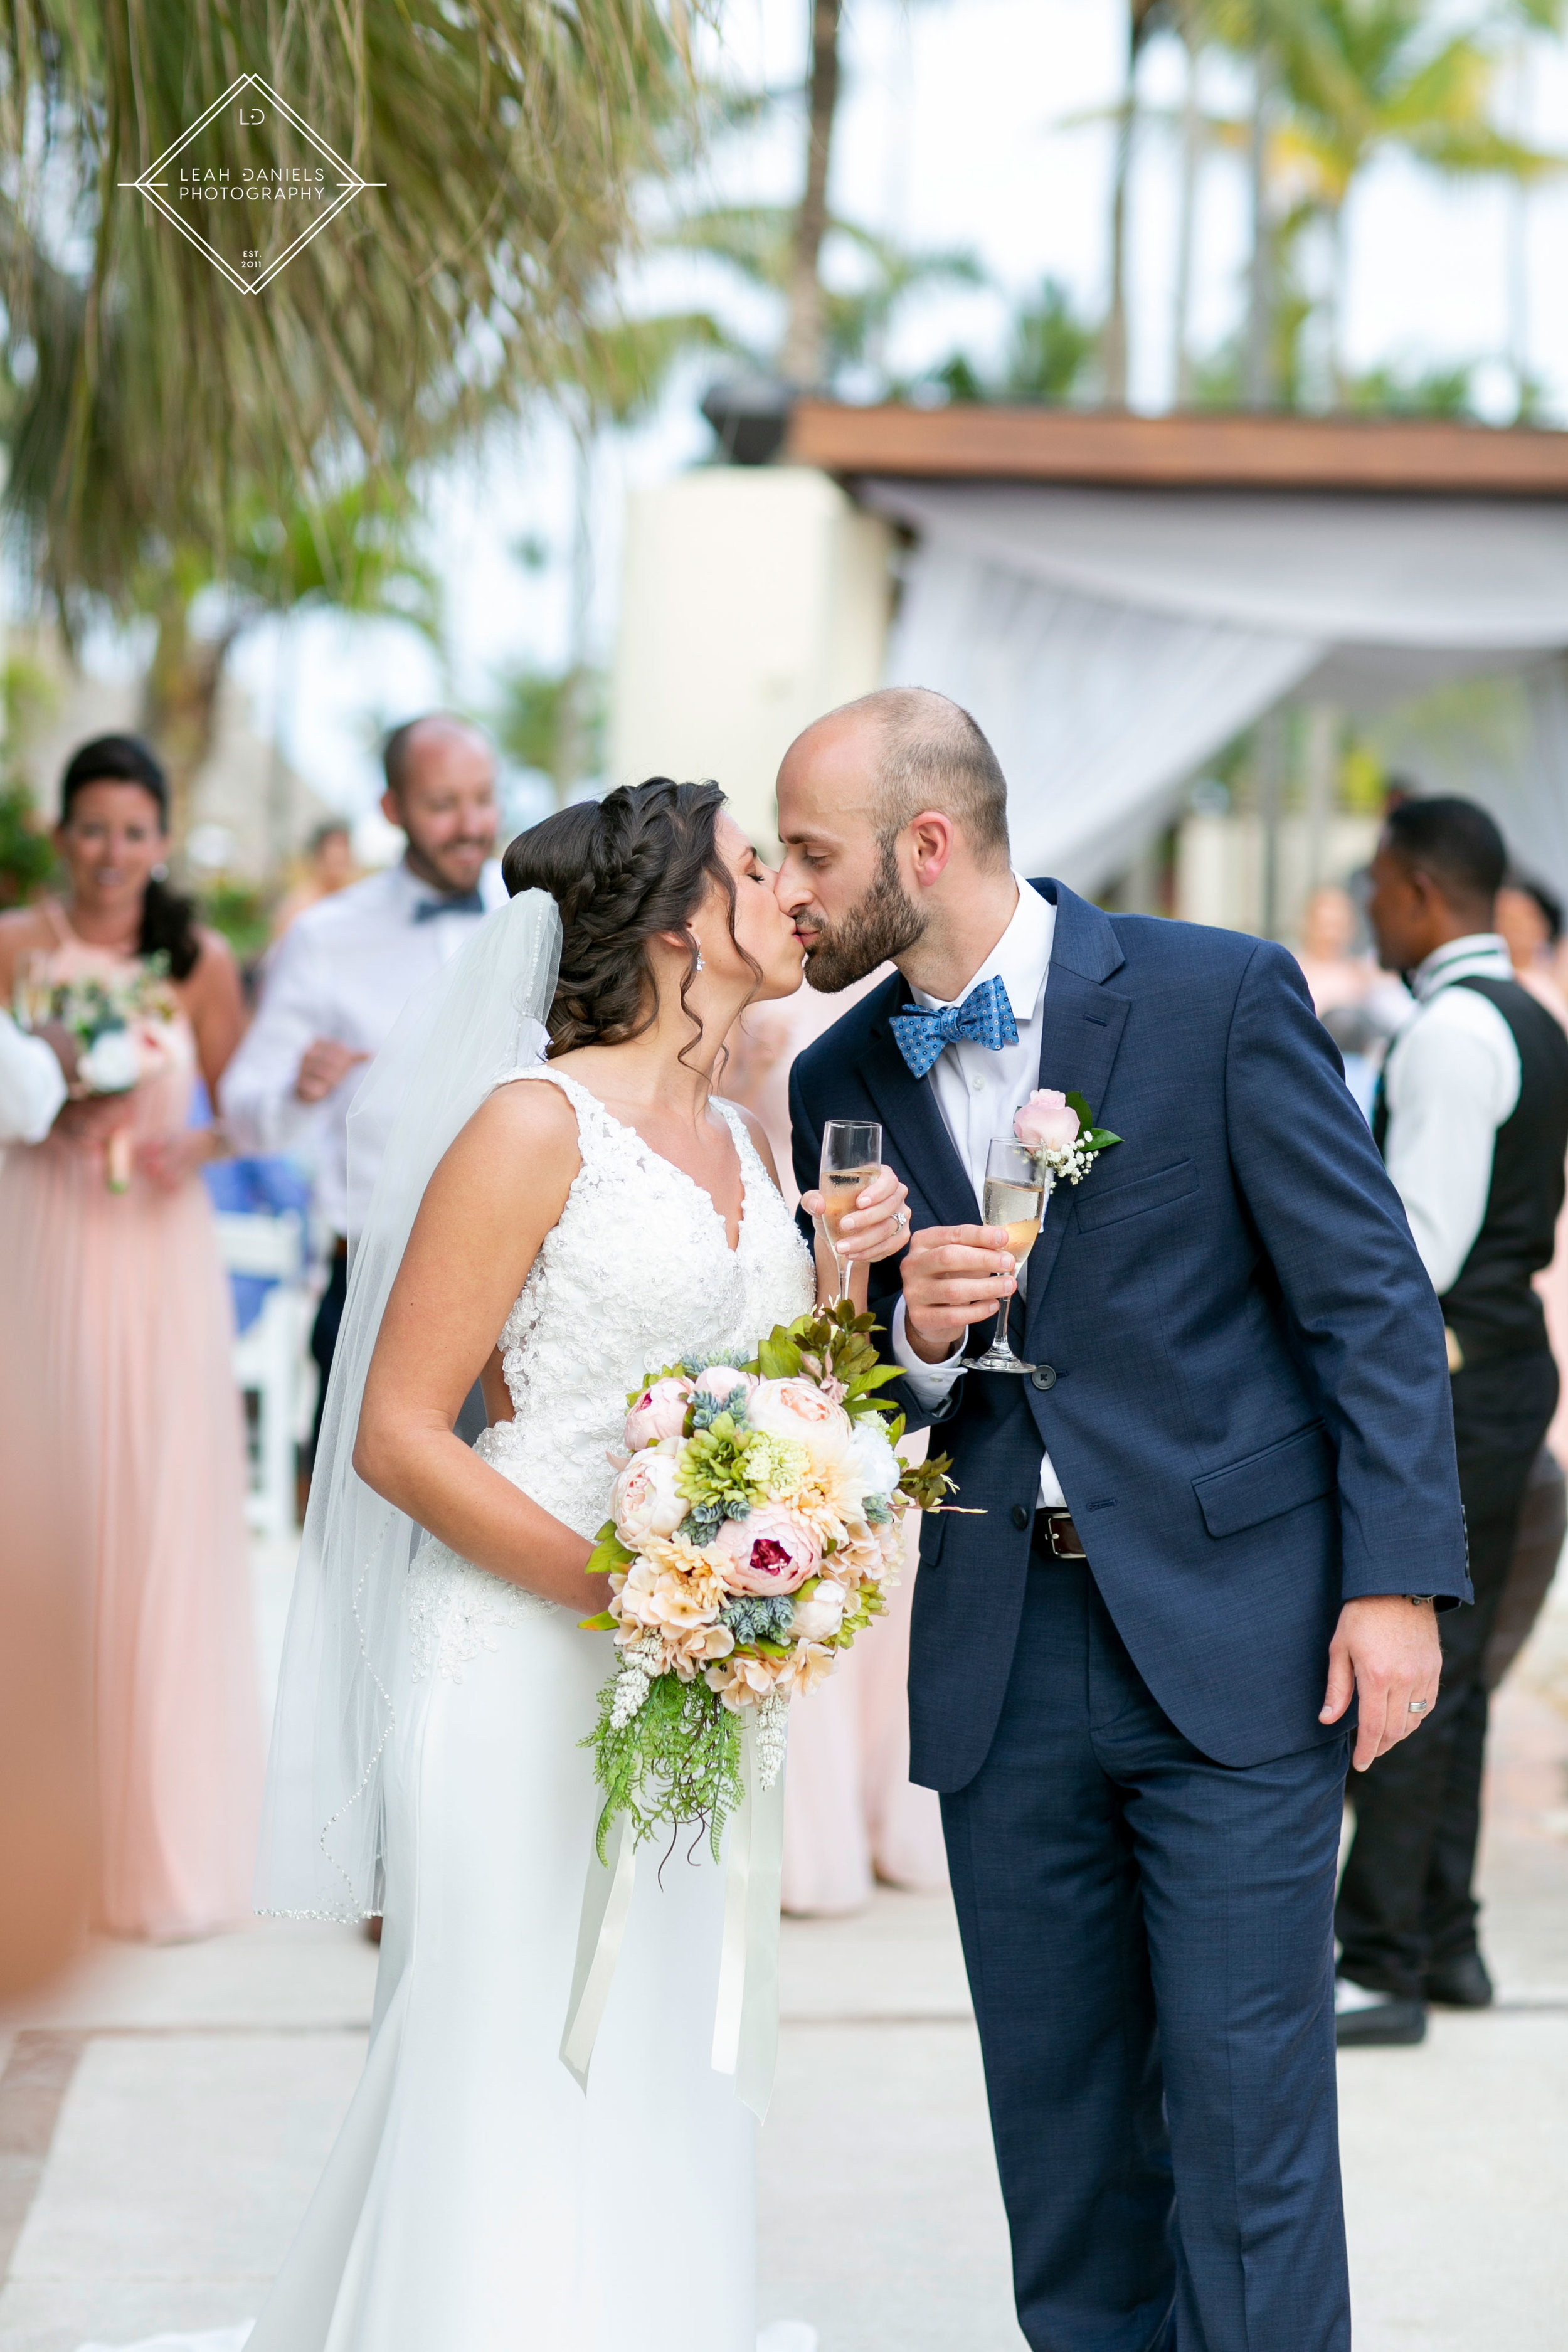 NOW Larimar Destination Wedding; The Bride and Groom